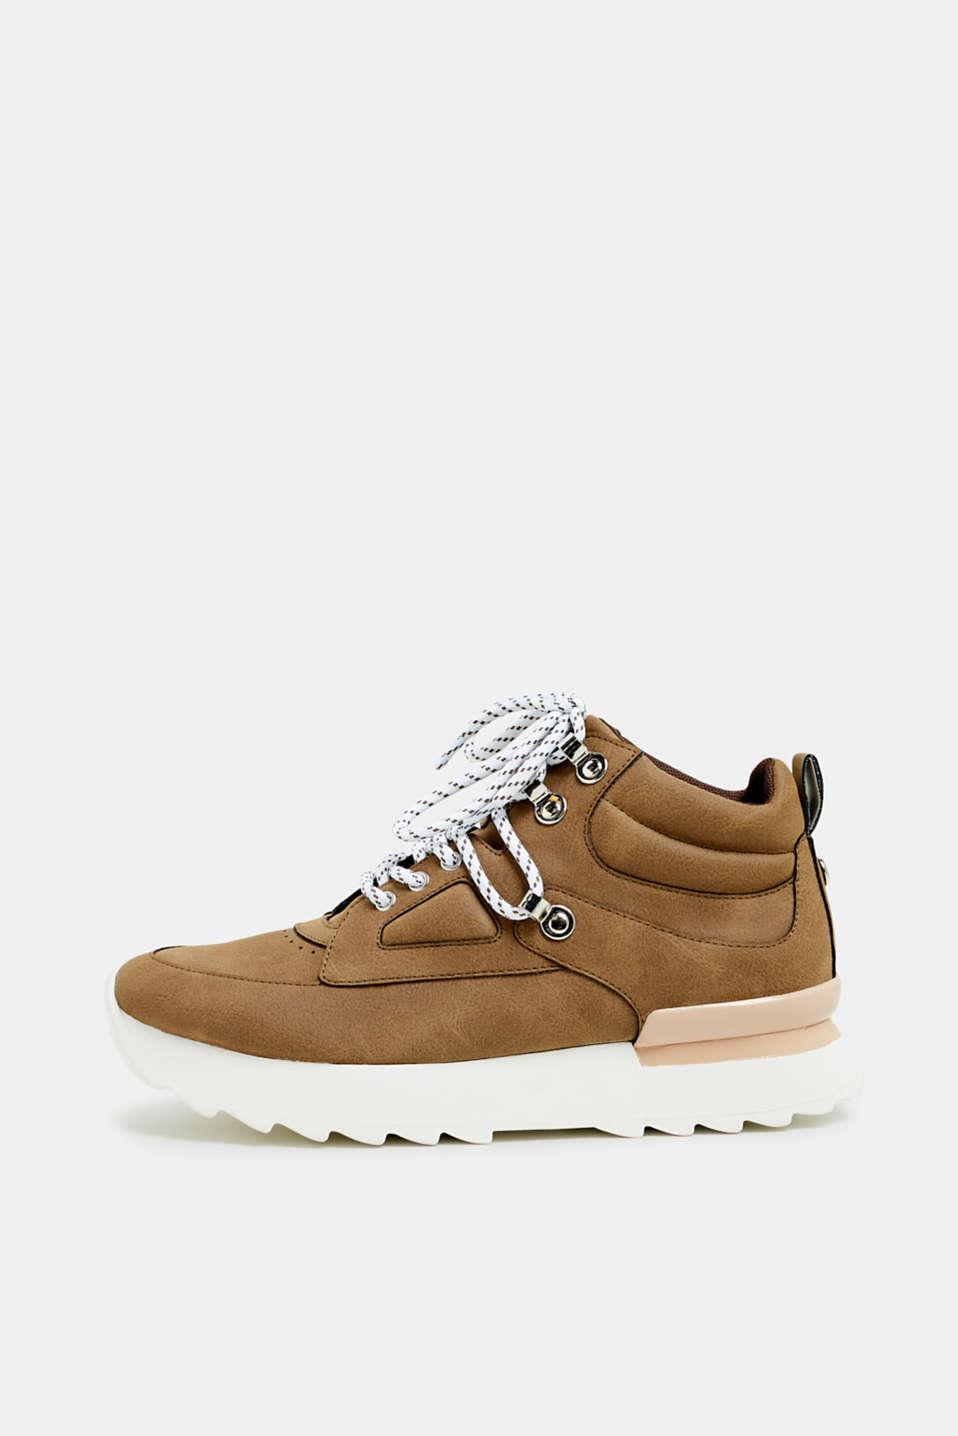 18062bac23 Esprit : Sneakers alte in similpelle nabuk nel nostro shop on-line